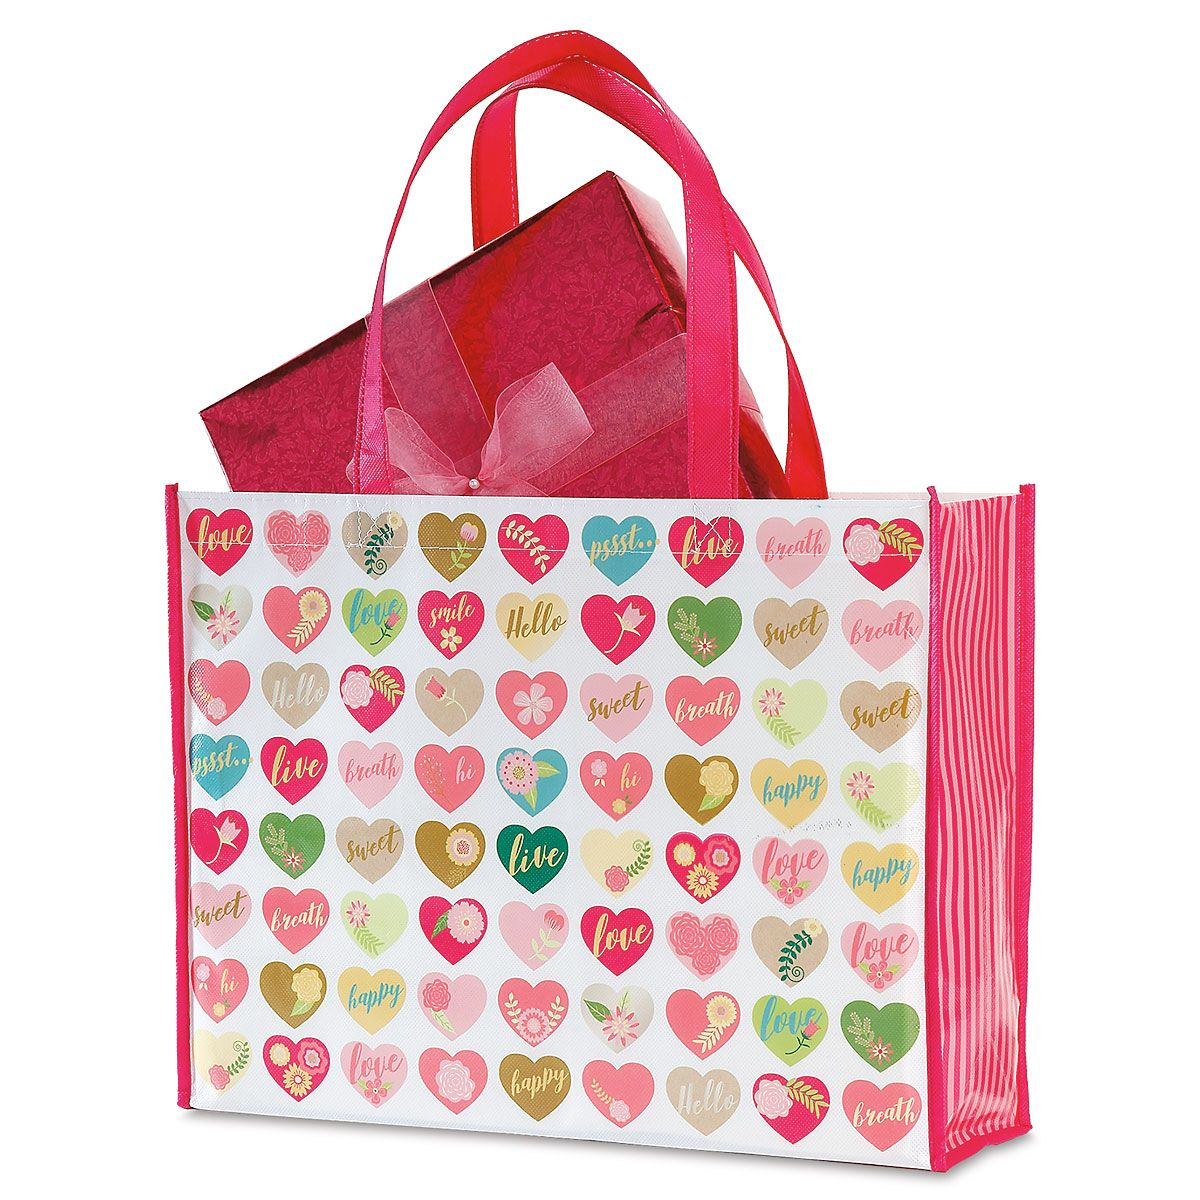 Valentine Shopping Bag - Buy 1 Get 1 Free